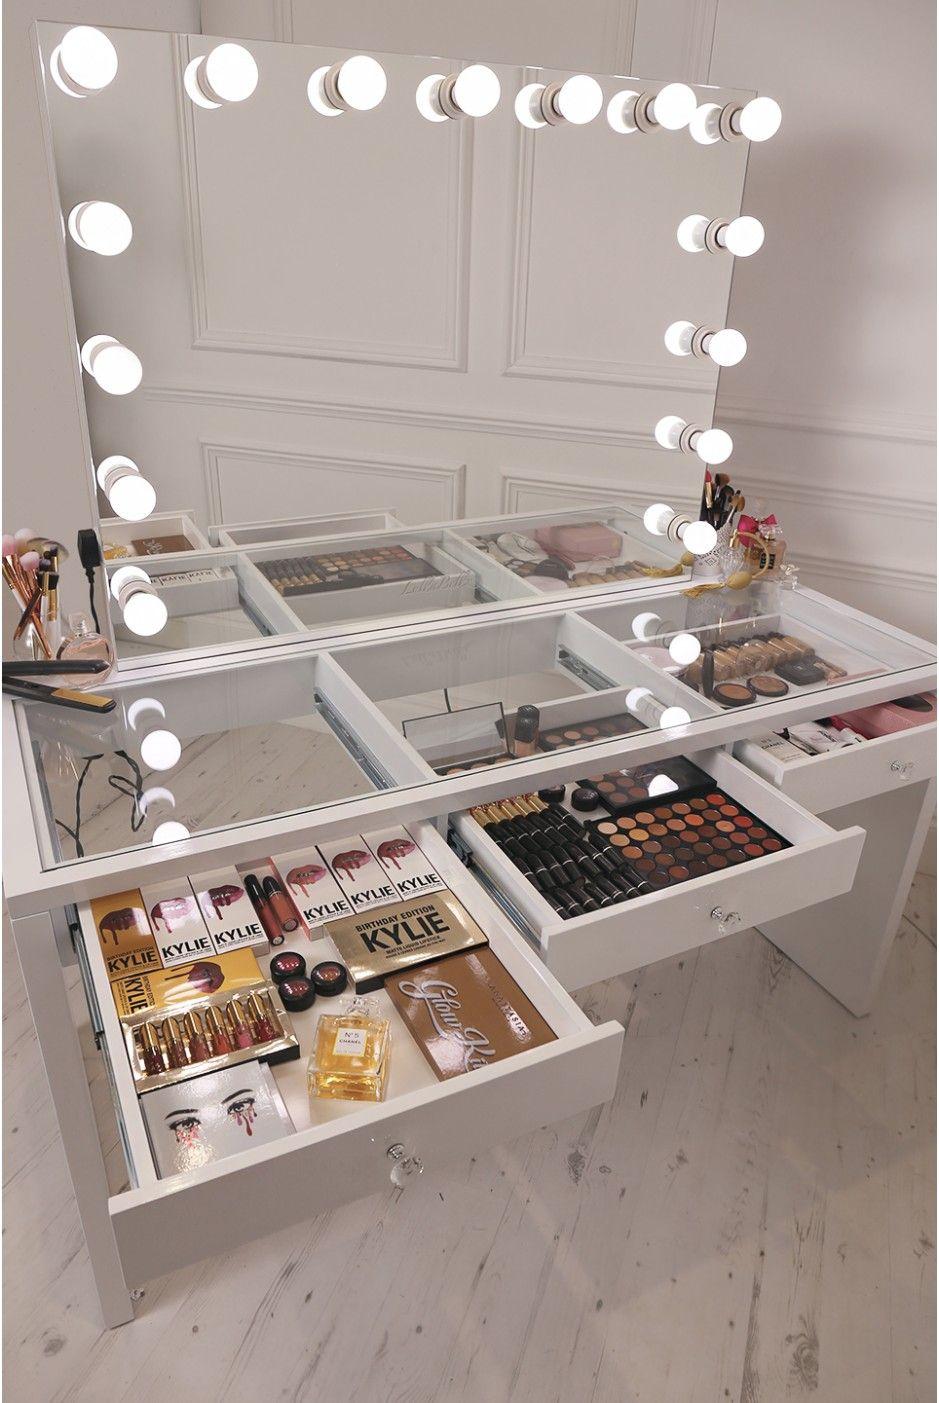 Crisp white finish slaystation make up vanity with premium storage